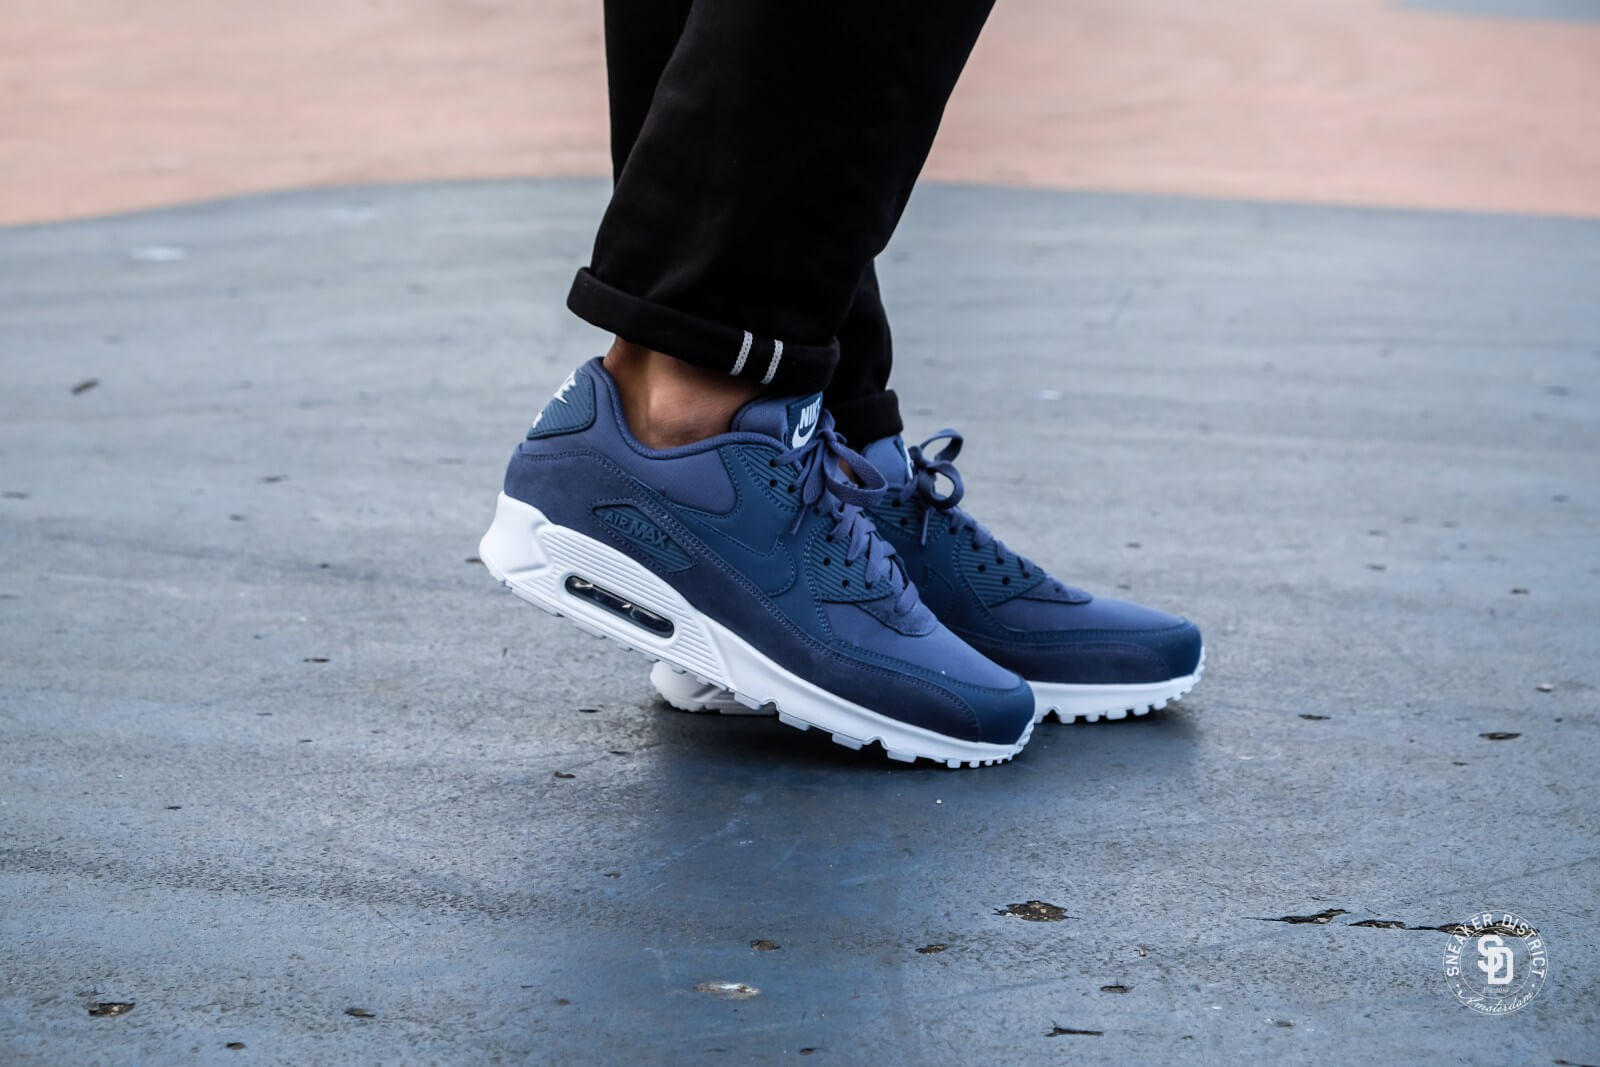 Nike Air Max 90 Essential Diffused Blue/White